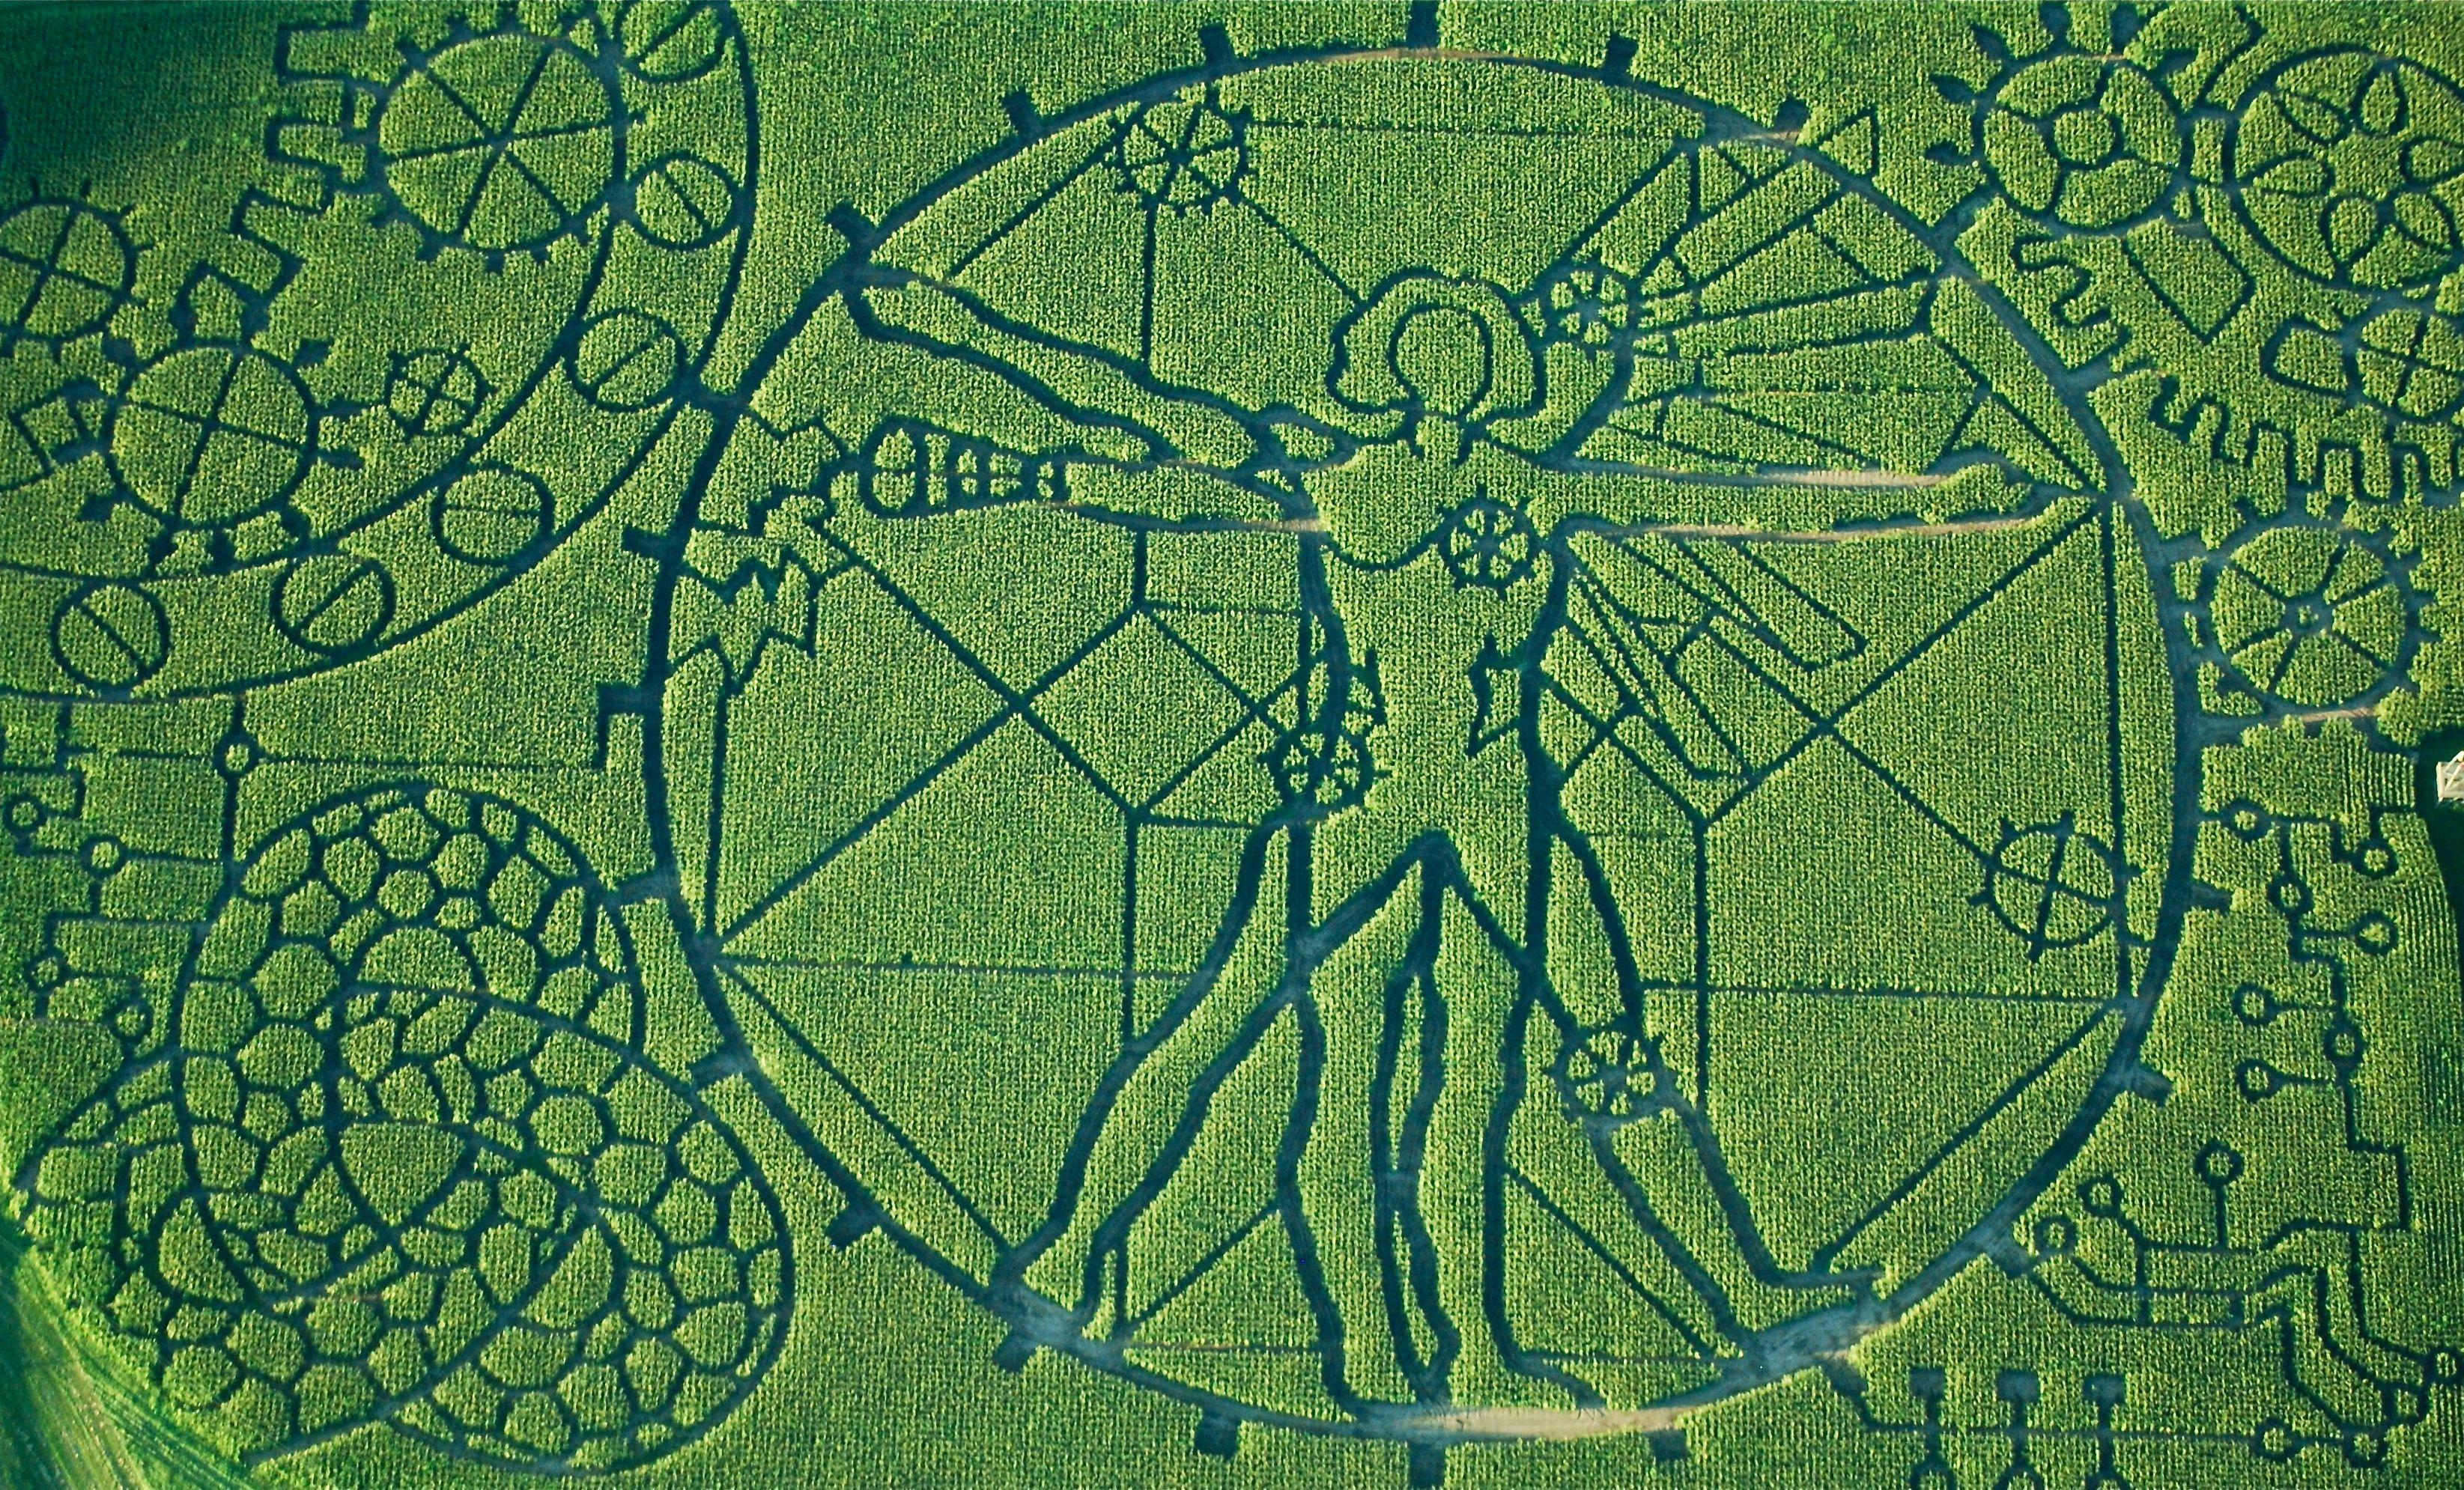 Corn Maze Craze Get Lost In Halloween Horror Fields